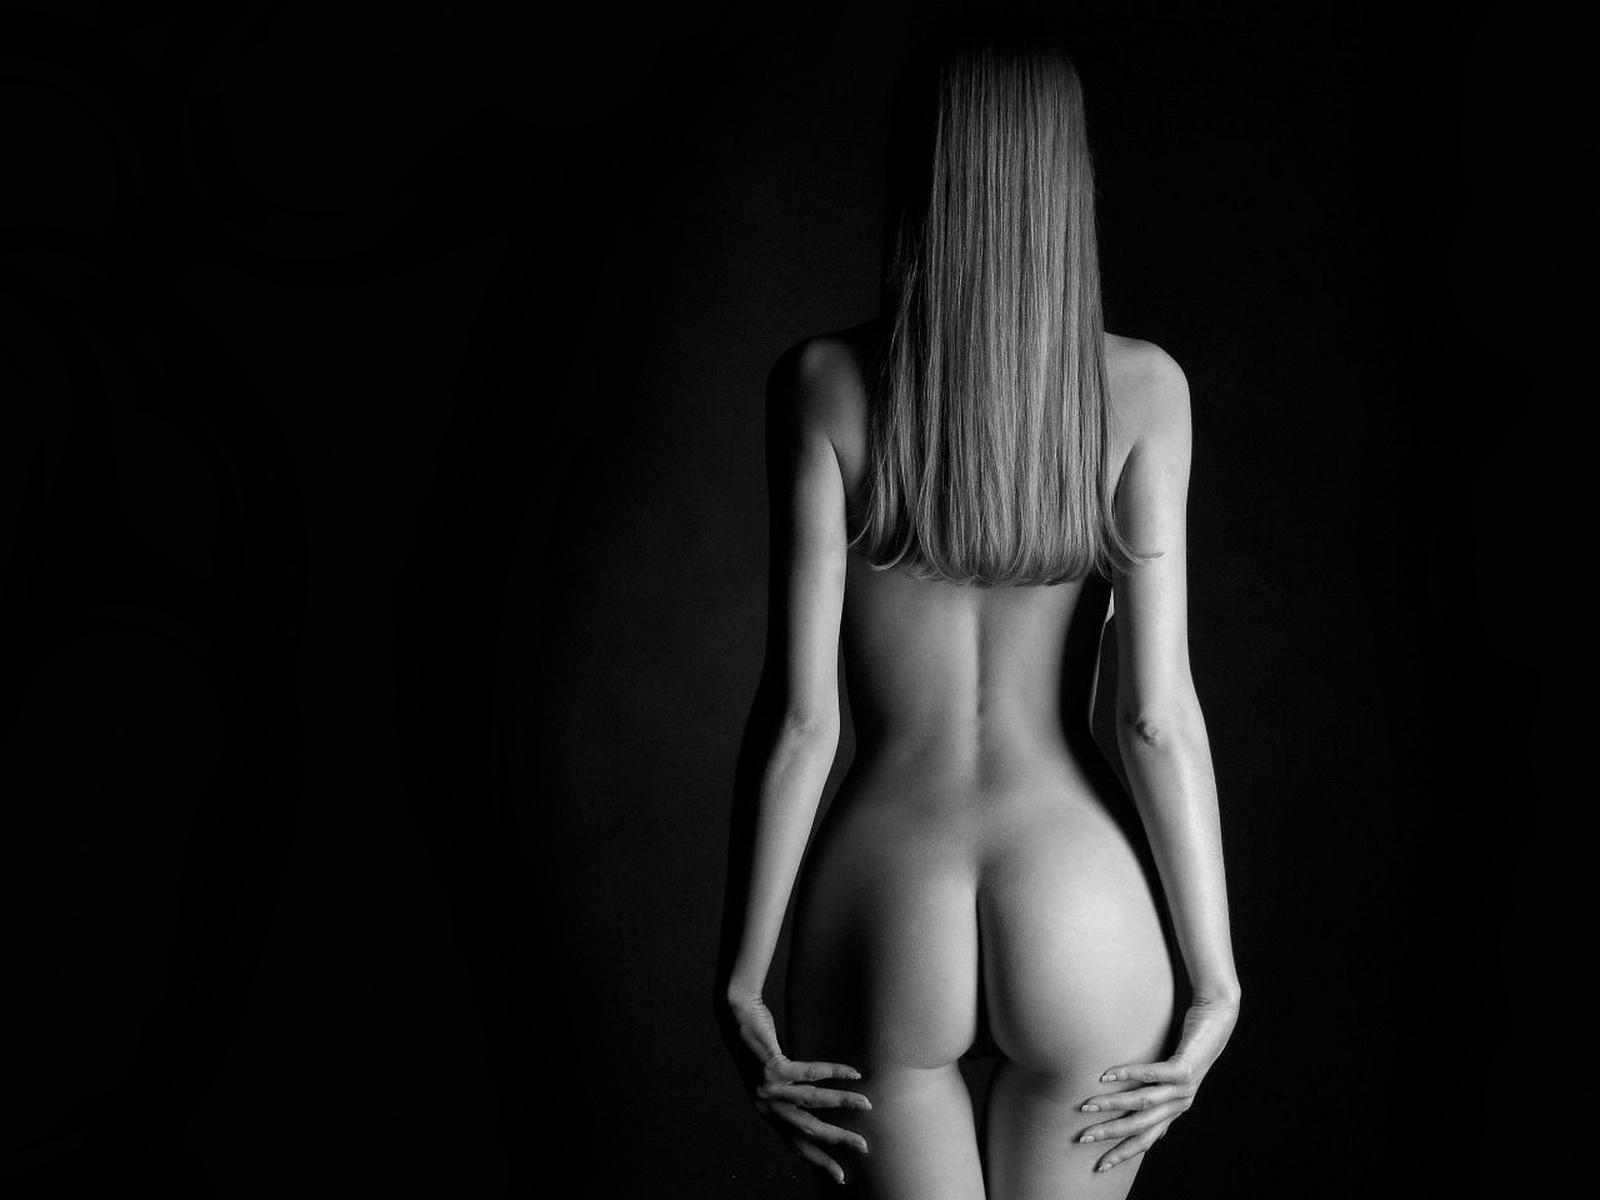 Nude women screensavers that move, sleeping topless amateur girls